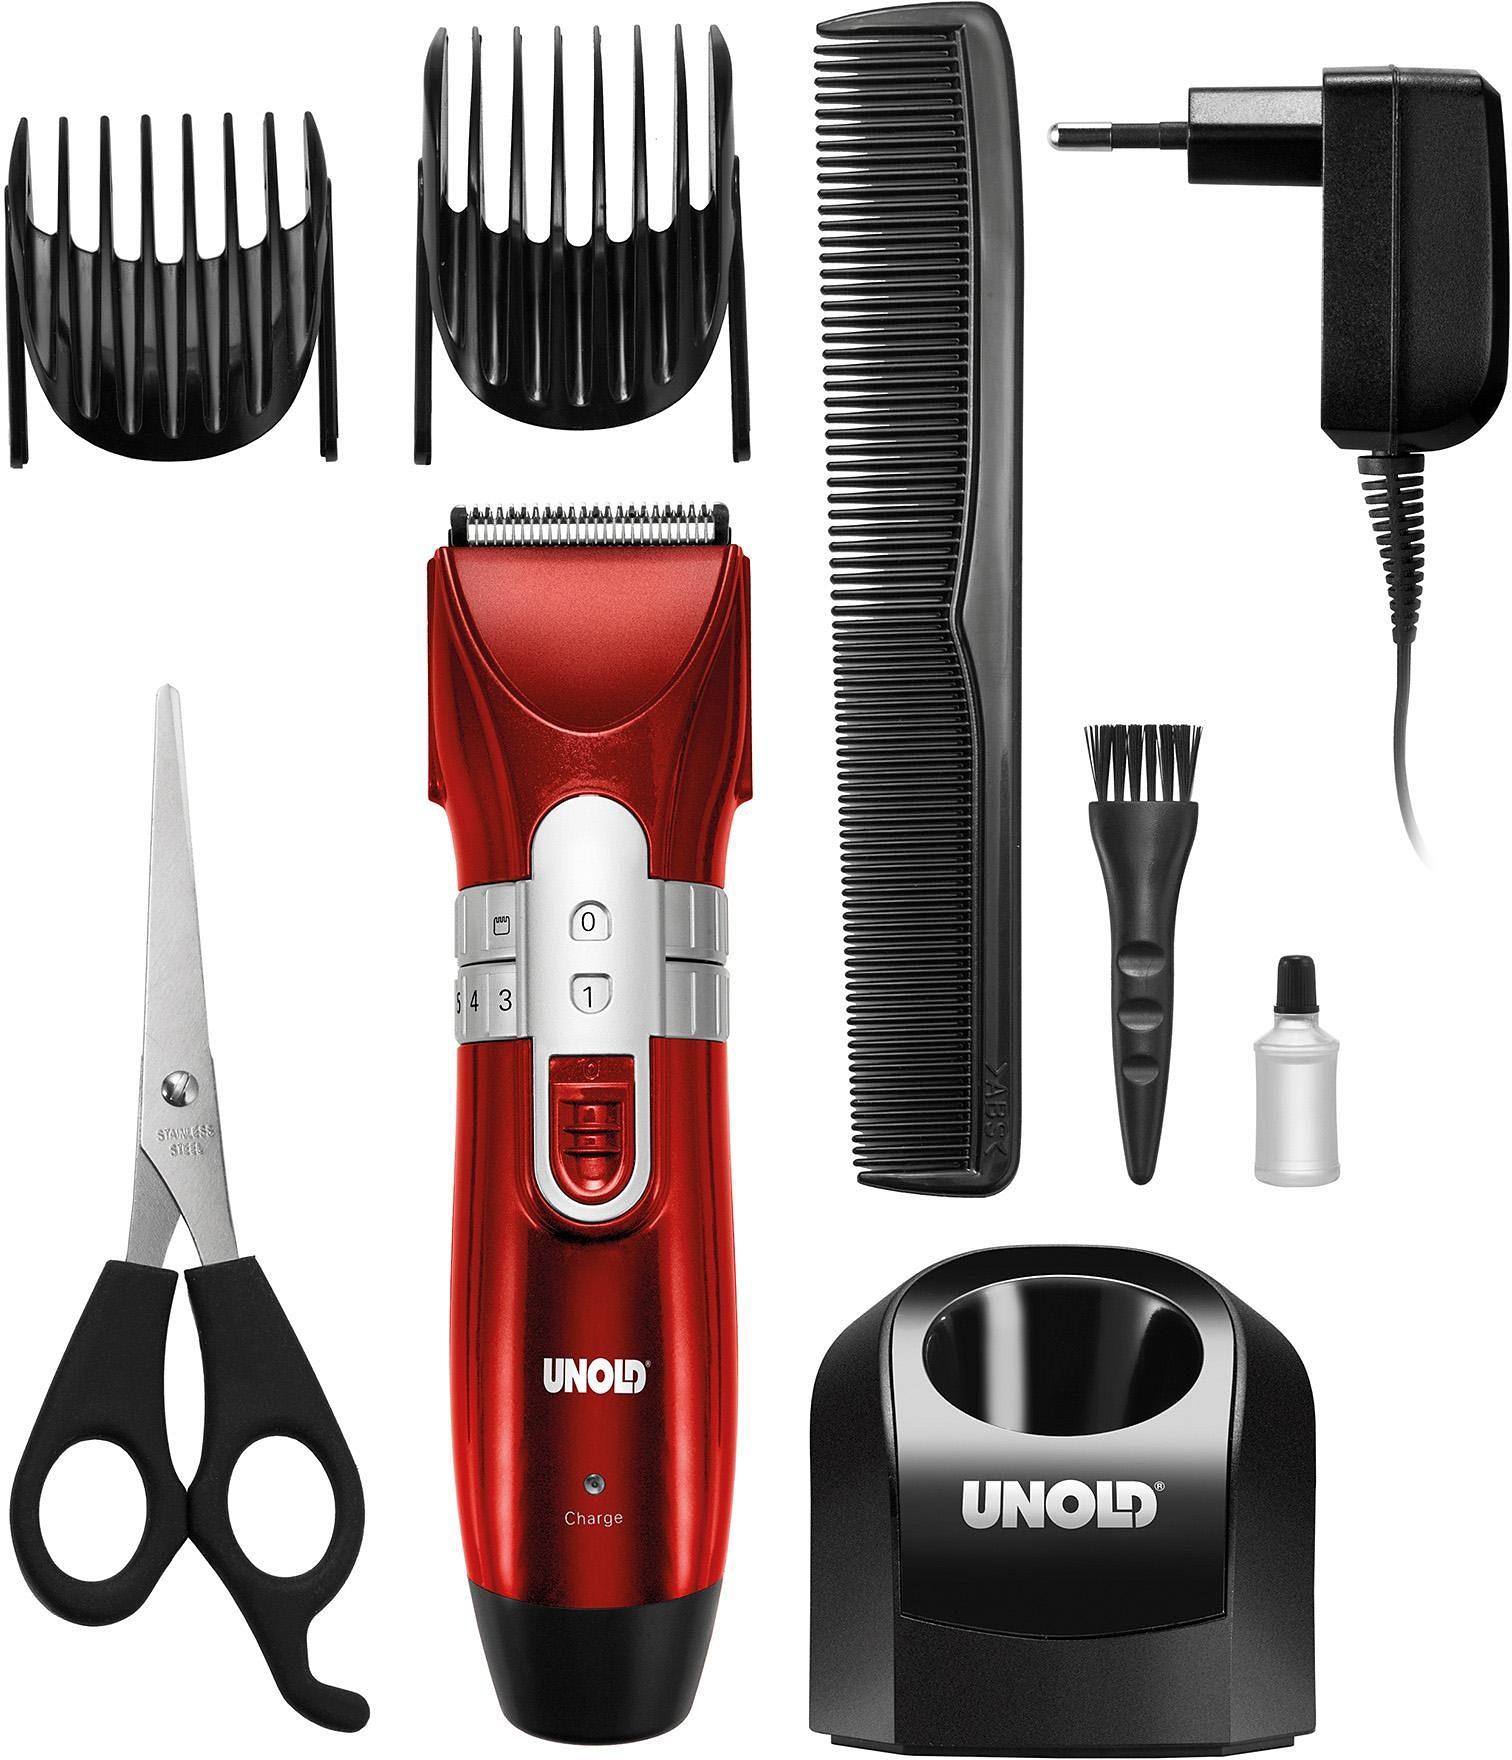 Unold Rasierer Hair Cutter 87813, Kabellos mit entnehmbarem Mignon NI-MH-Akku